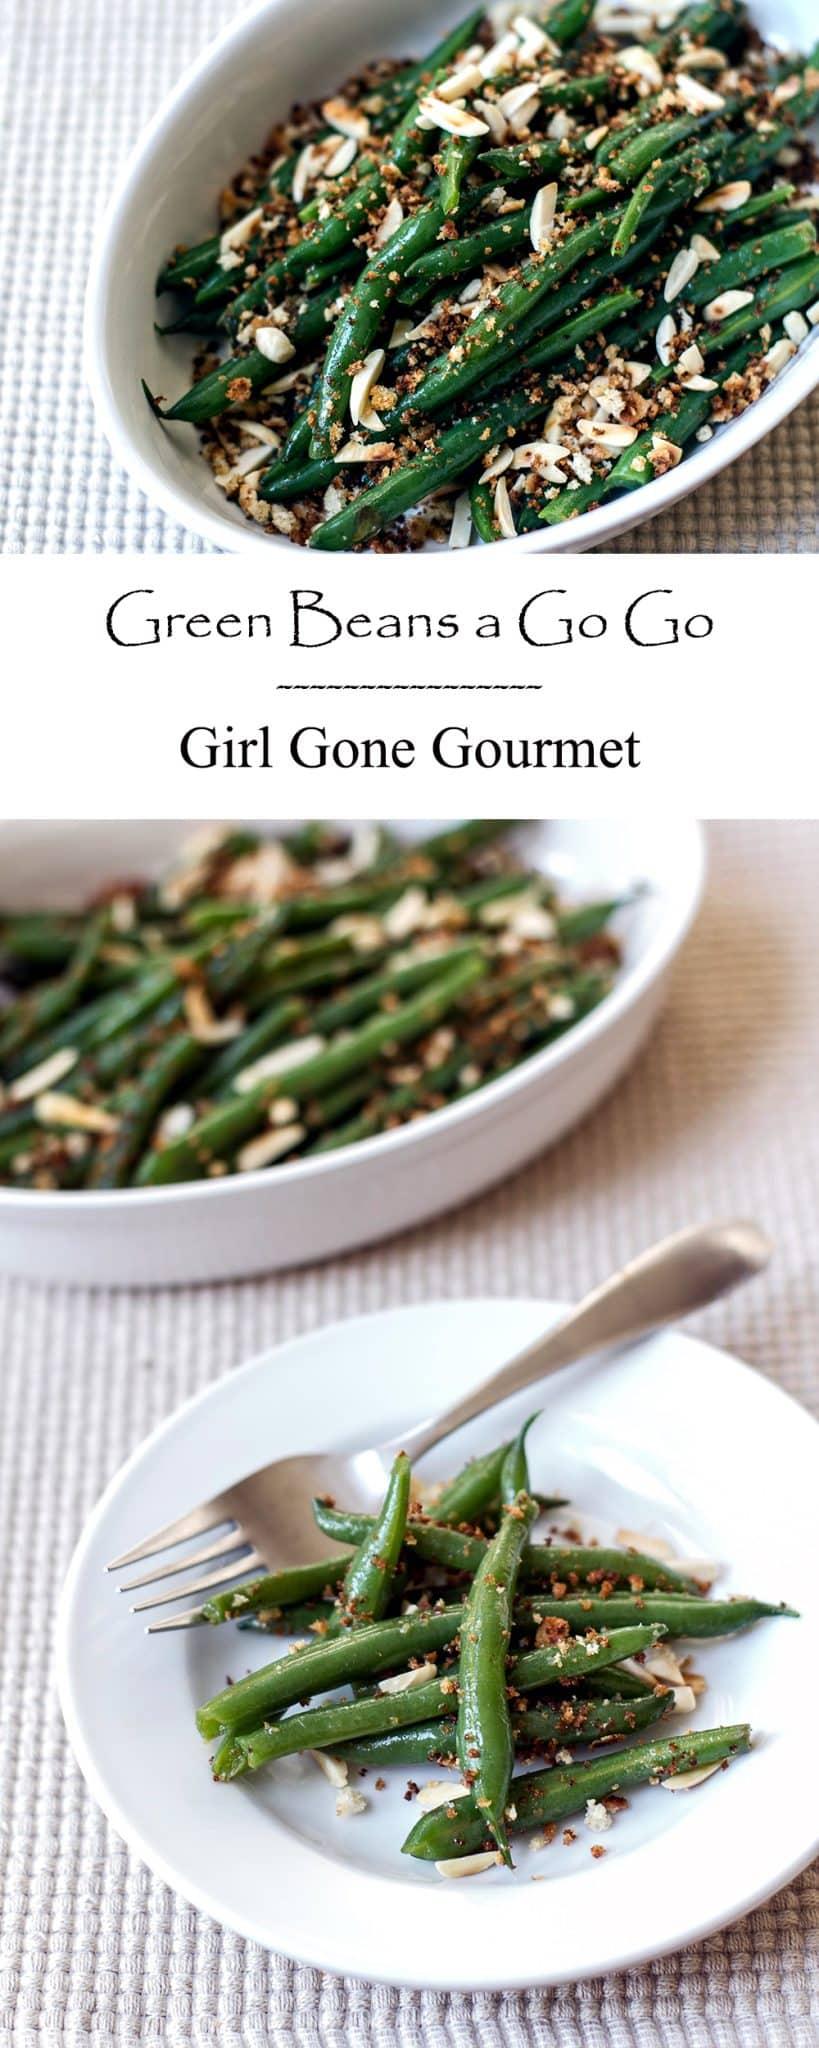 Green Beans a Go Go | Girl Gone Gourmet